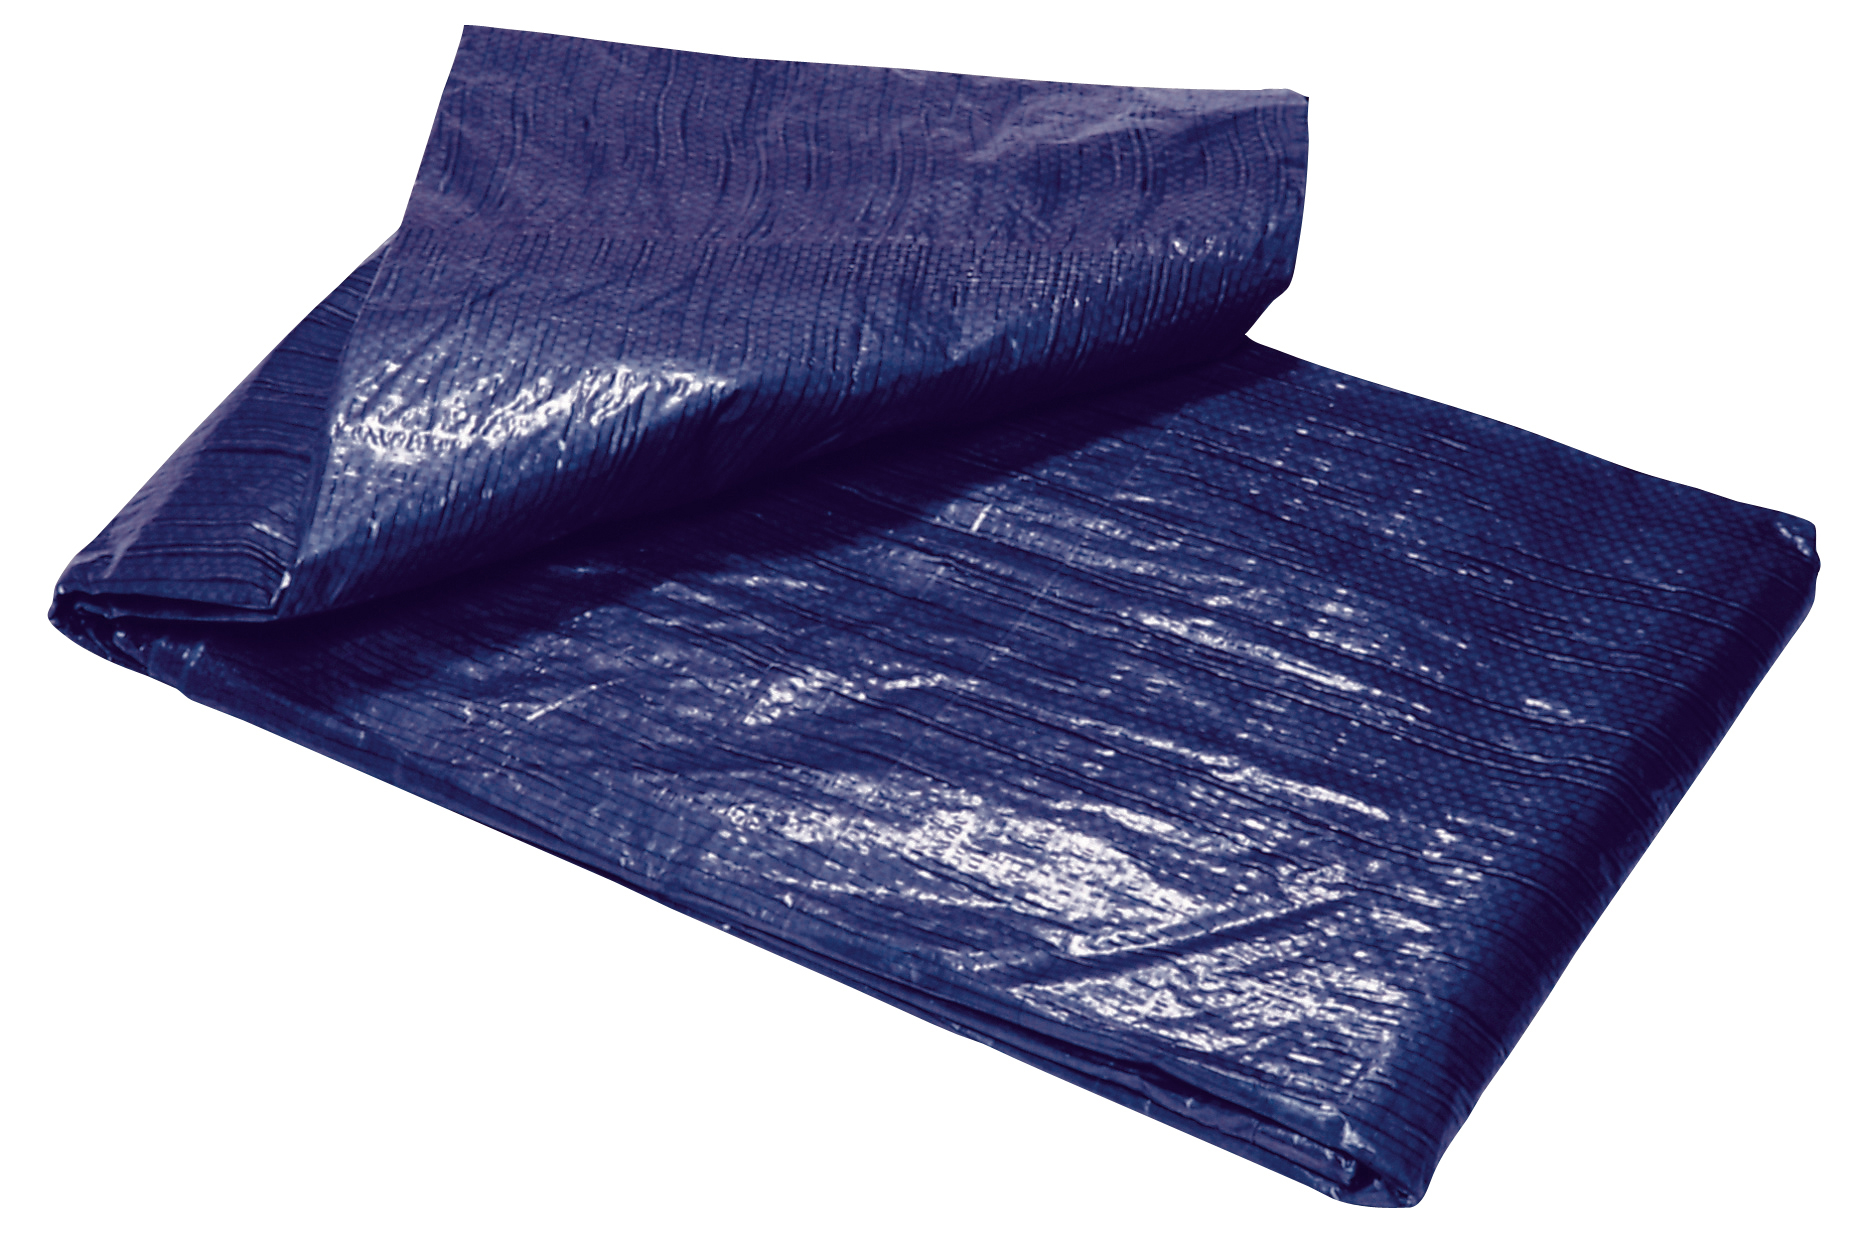 Plachta Tarpaulin Standard 04x05, prekrývacia, 80 g/m2, modrá